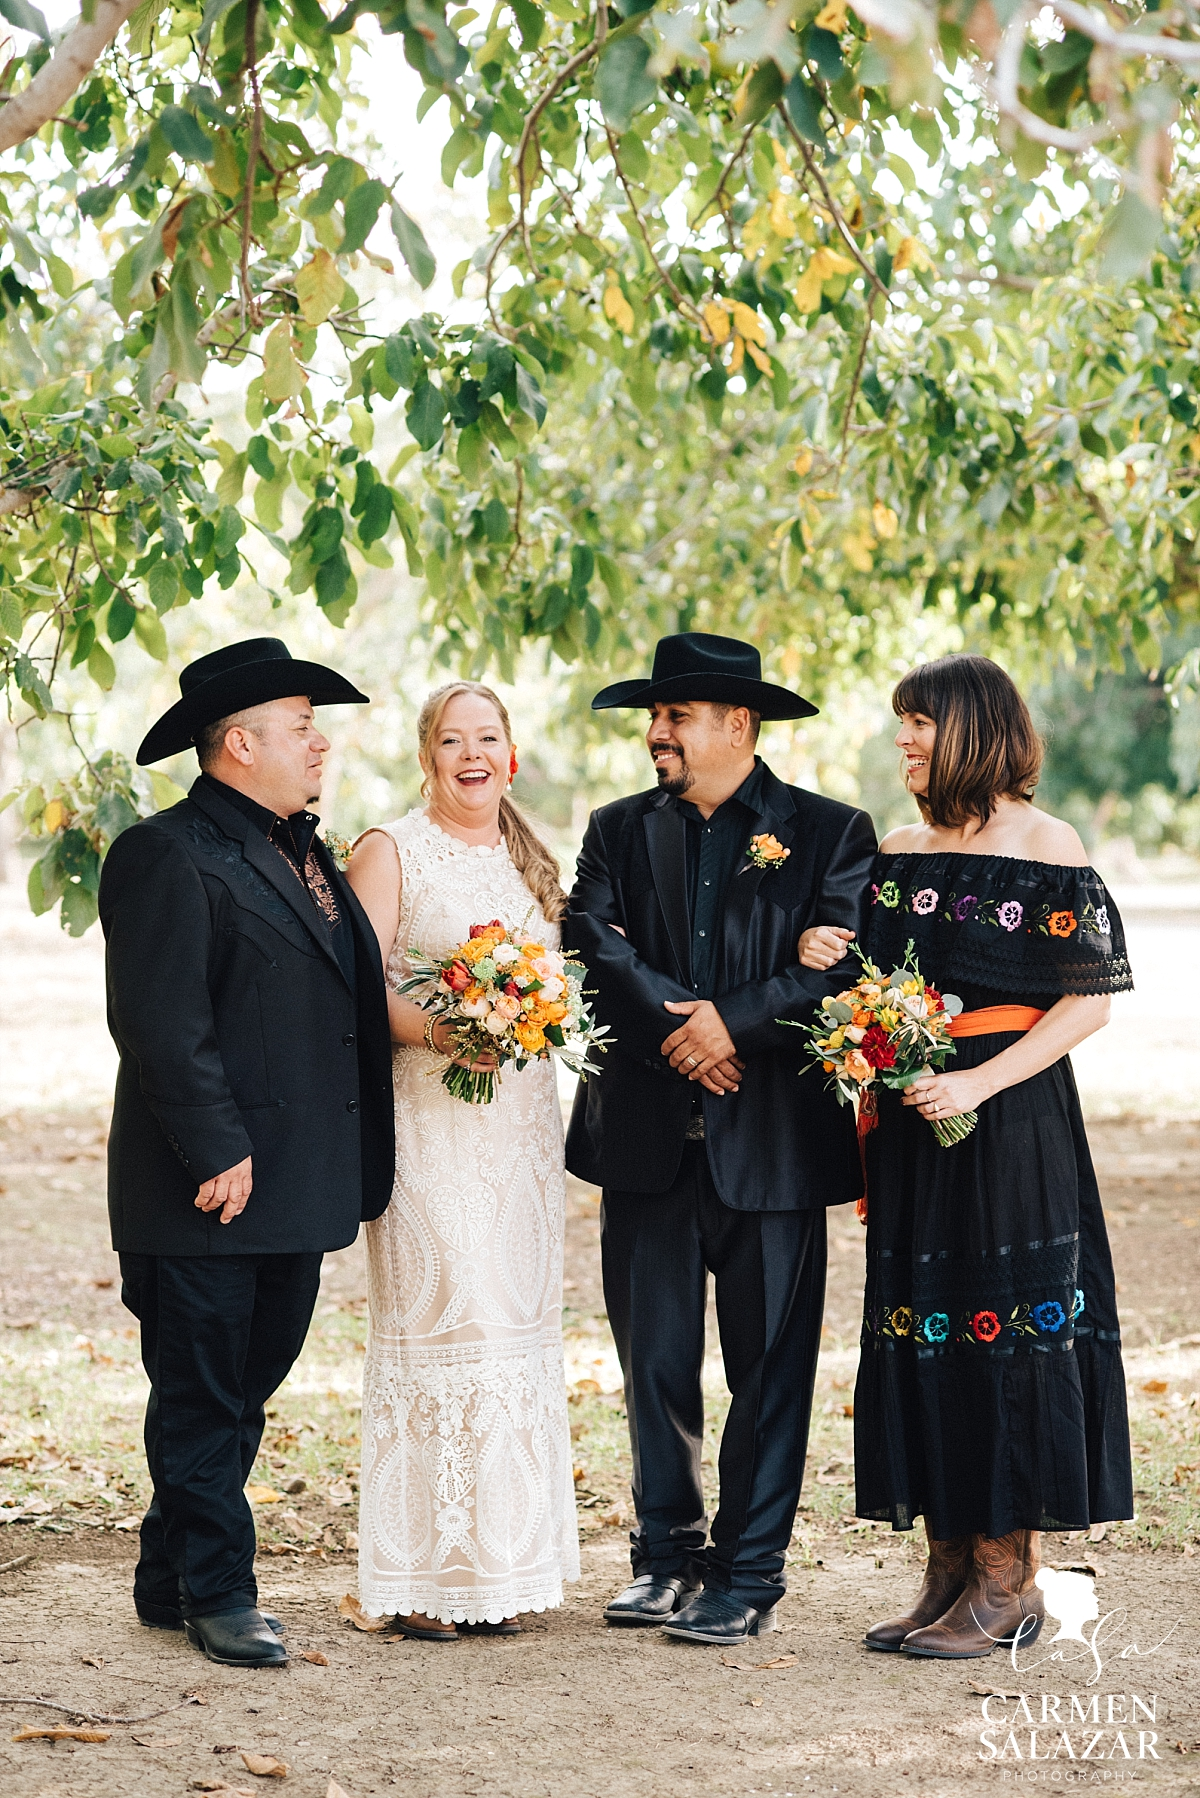 Intimate Mexican wedding party on farm - Carmen Salazar